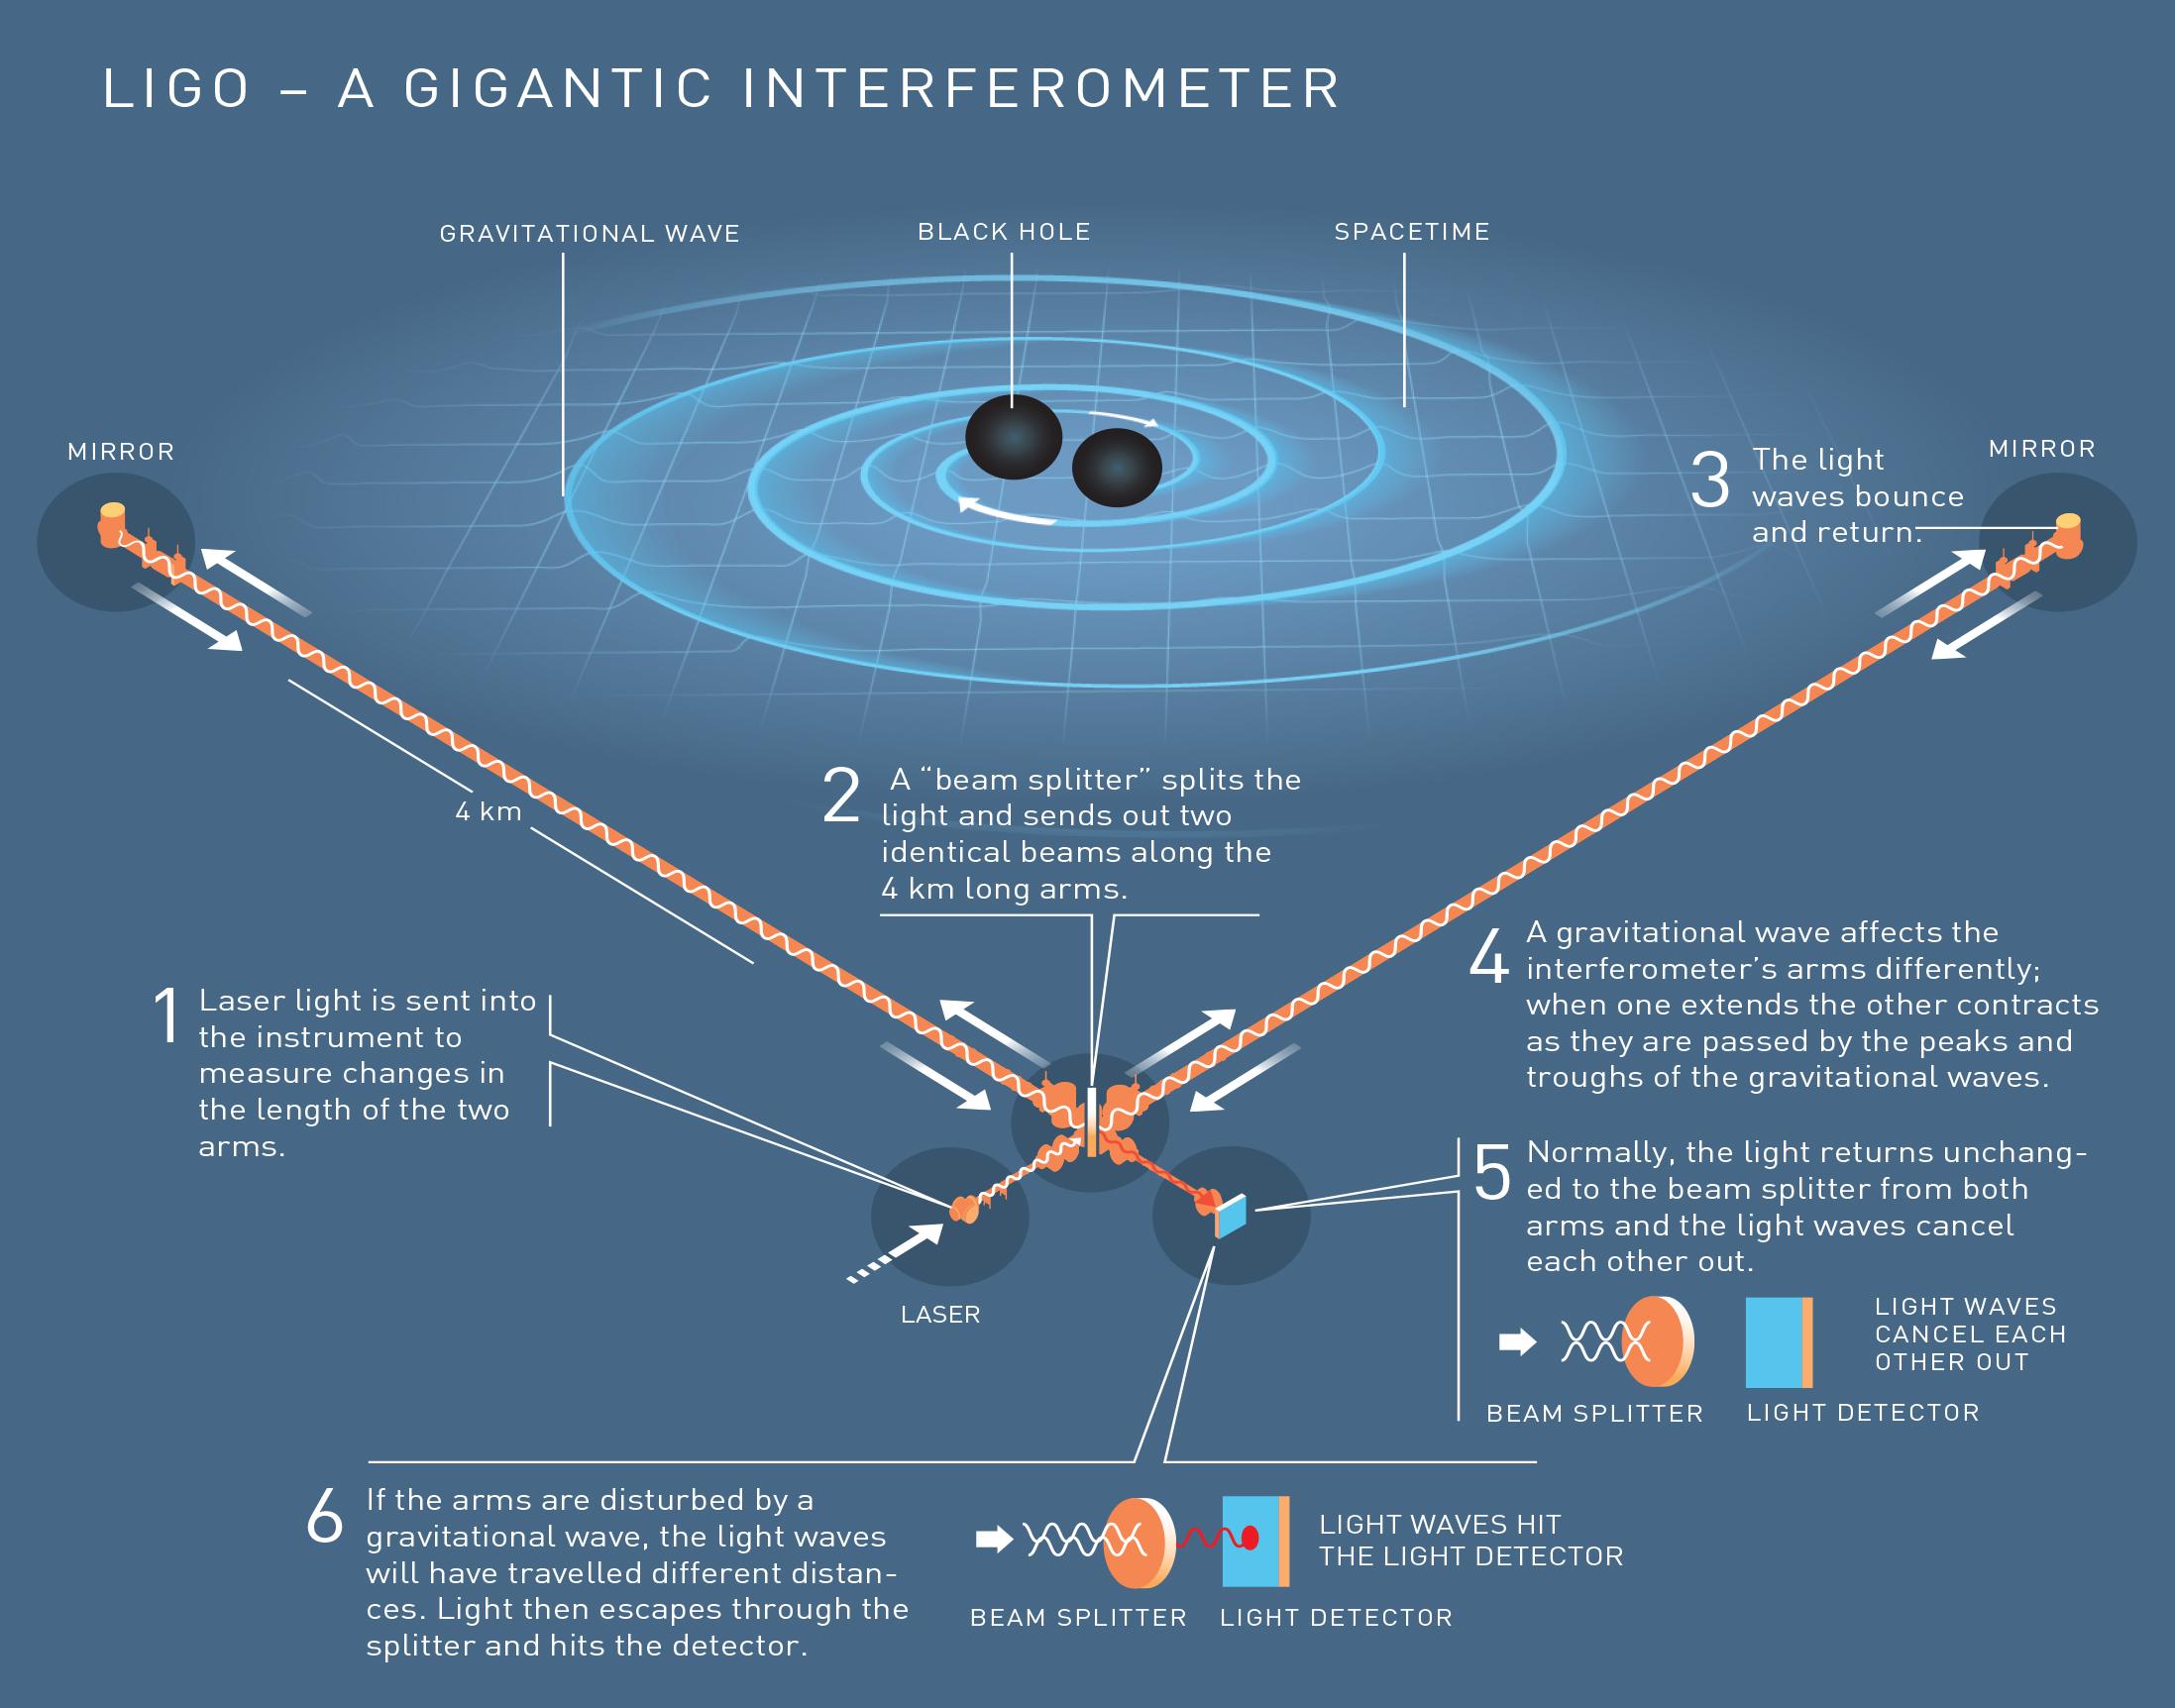 Image: LIGO - A gigantic interferometer